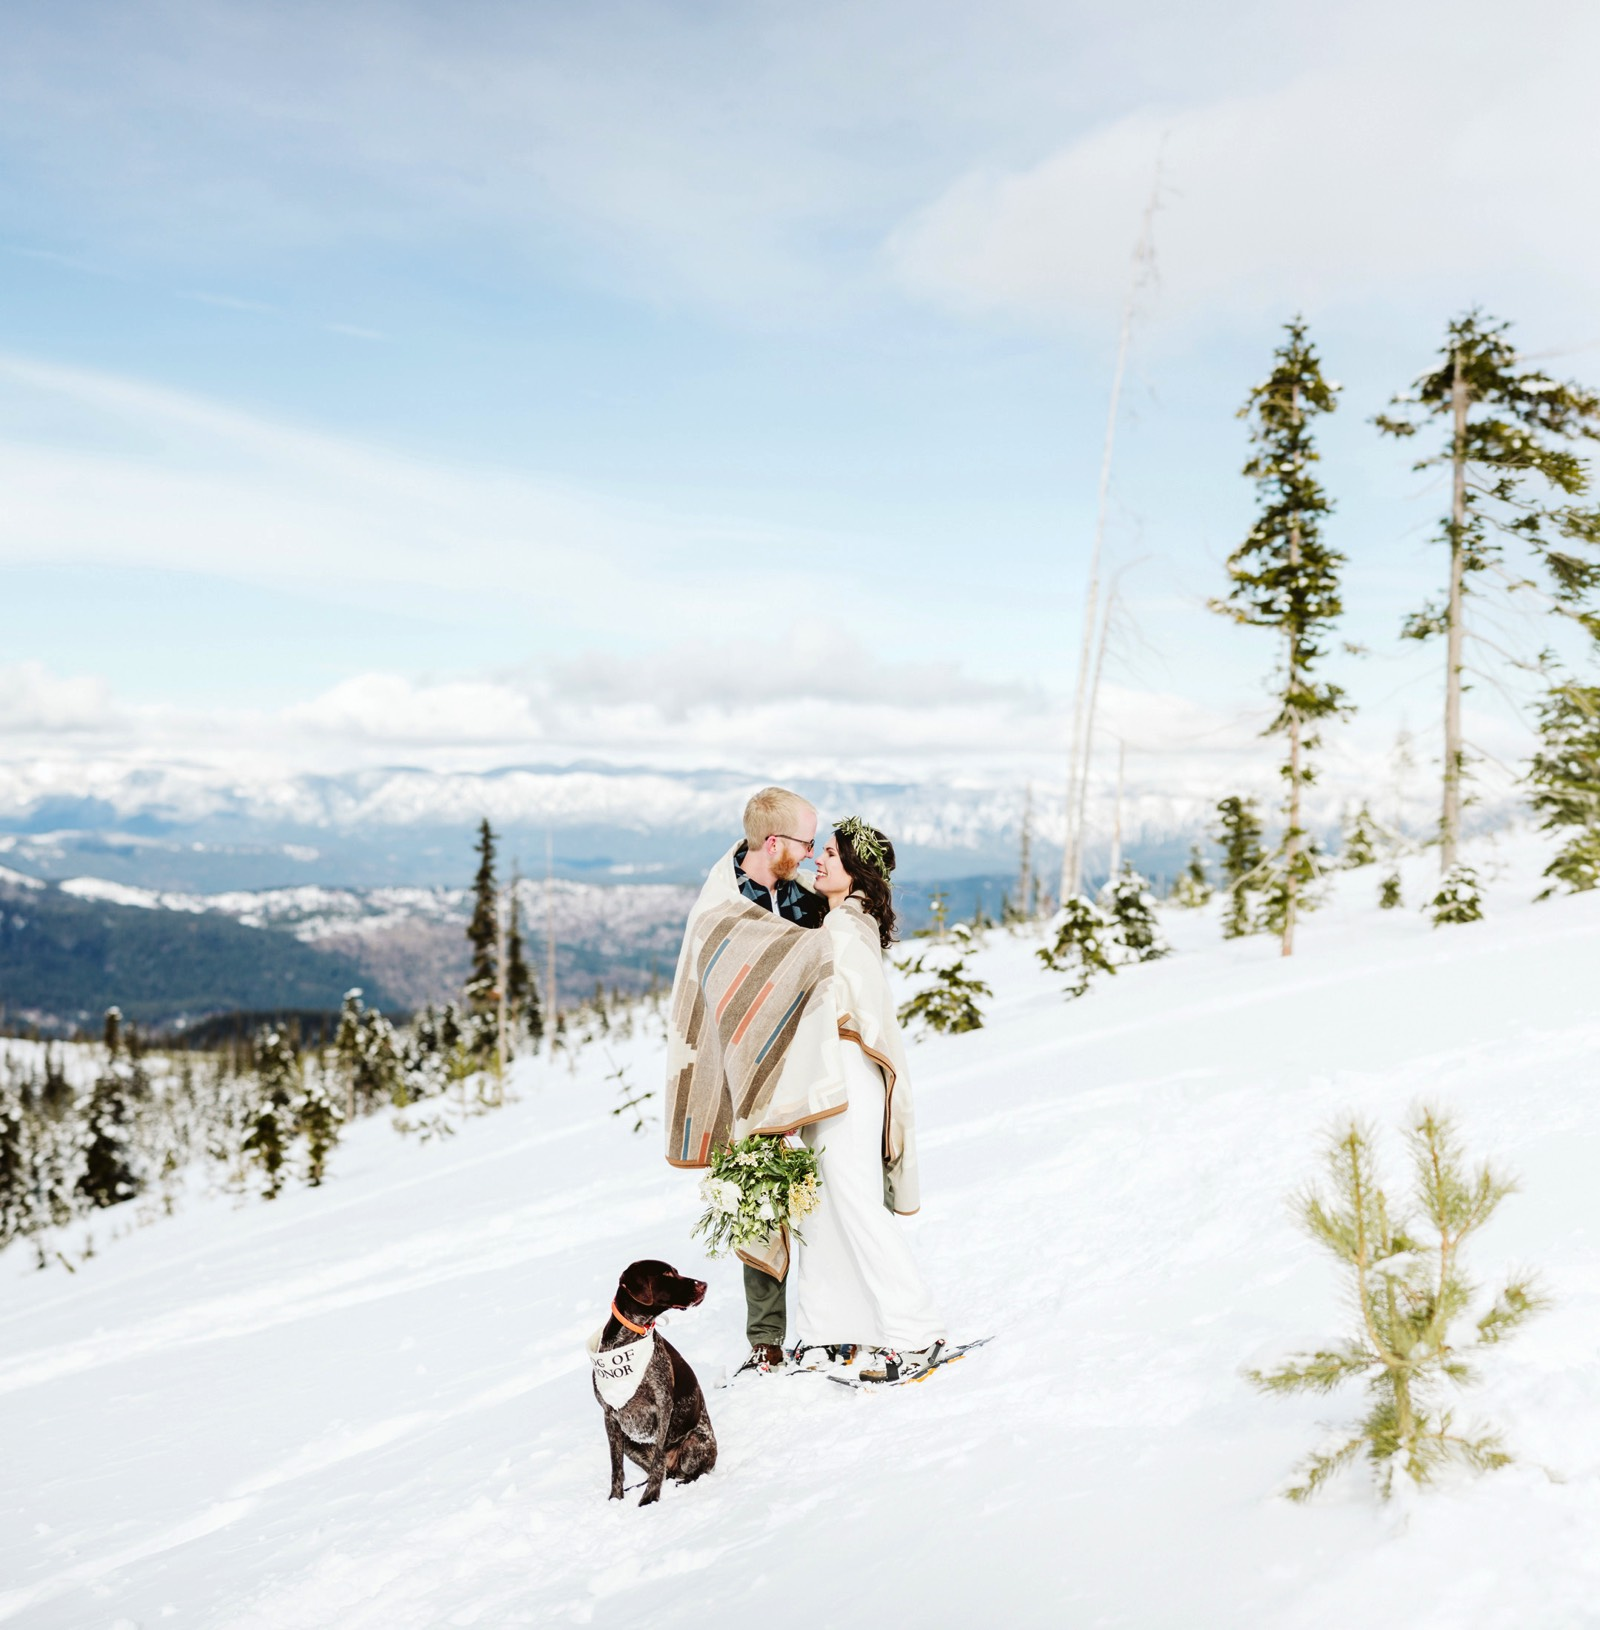 alpine-lakes-high-camp-winter-wedding-53 ALPINE LAKES HIGH CAMP WEDDING